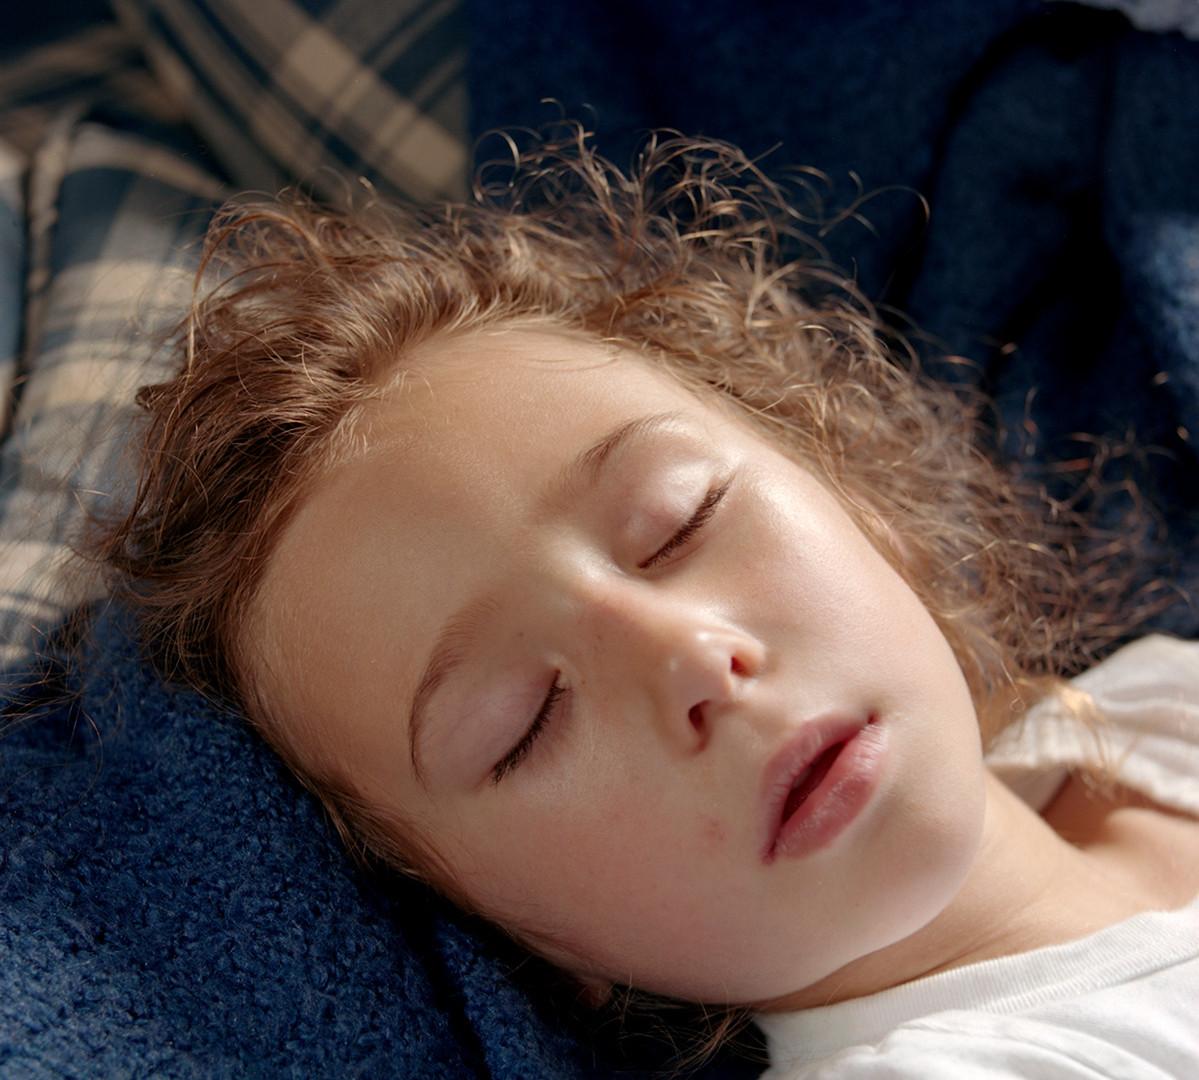 Jocelyn Lee, Untitled (Pearl sleeping), 2007